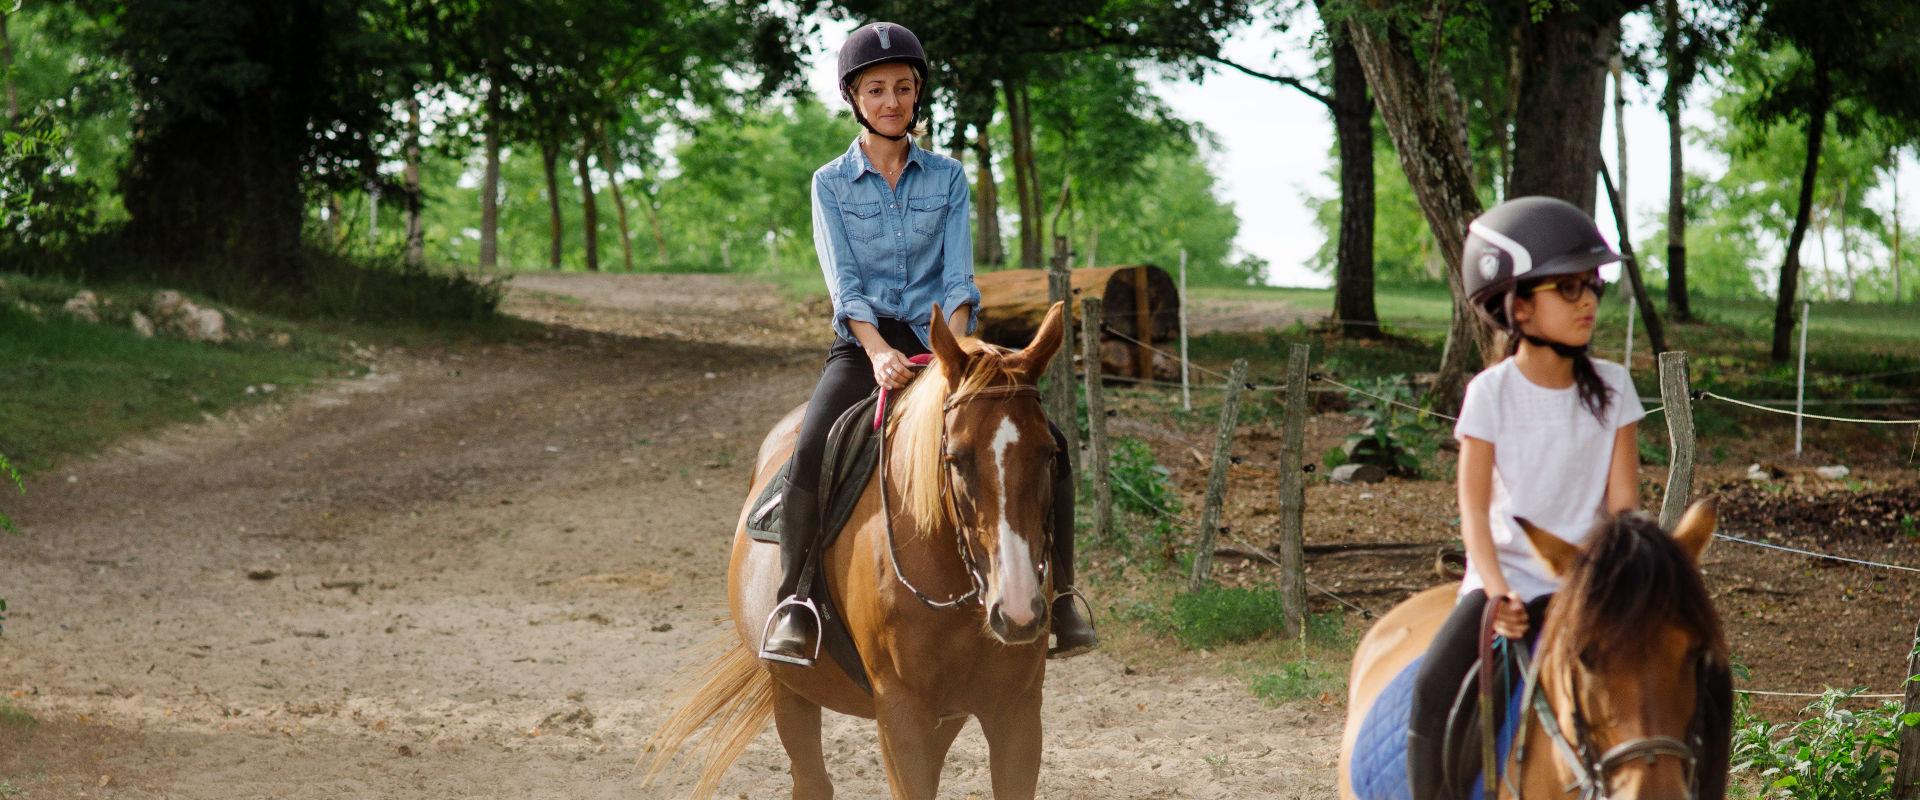 Balade à cheval en Val de Garonne Guyenne Gascogne